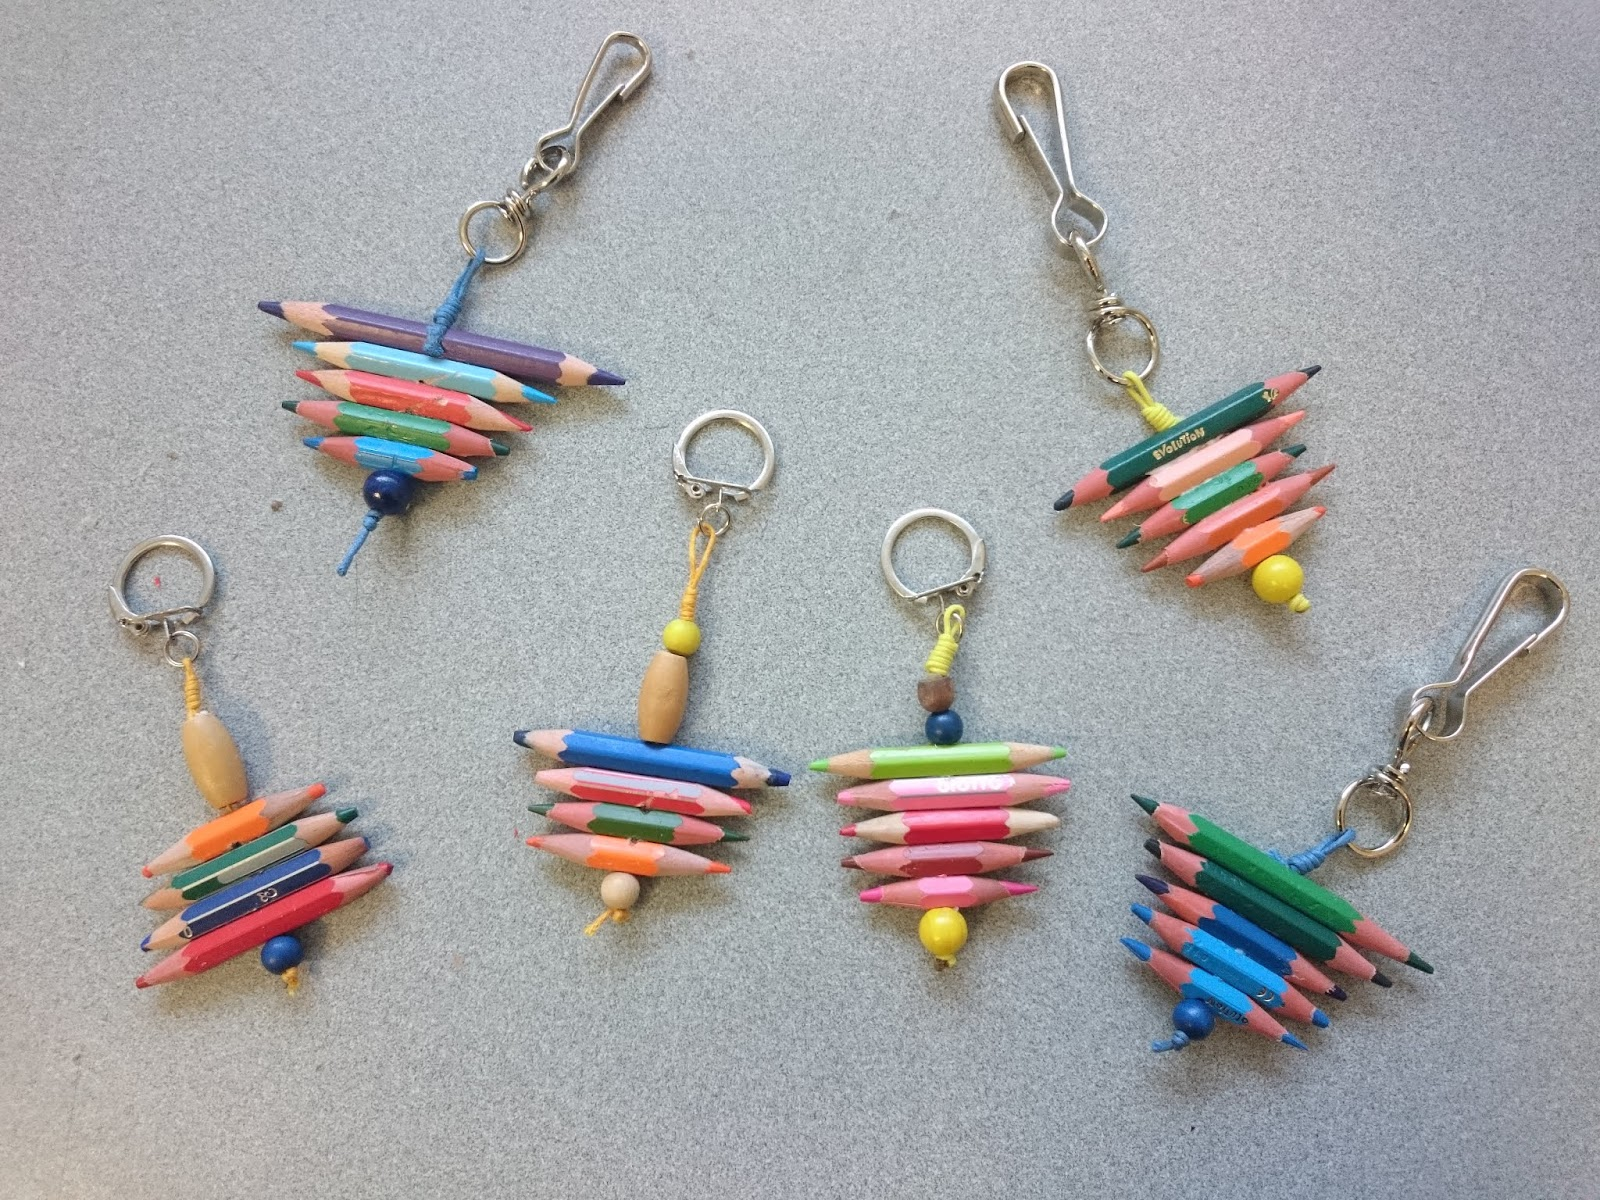 Diy Crayons Recycles Un Porte Cles Sympa Idee De Cadeau Fait Main